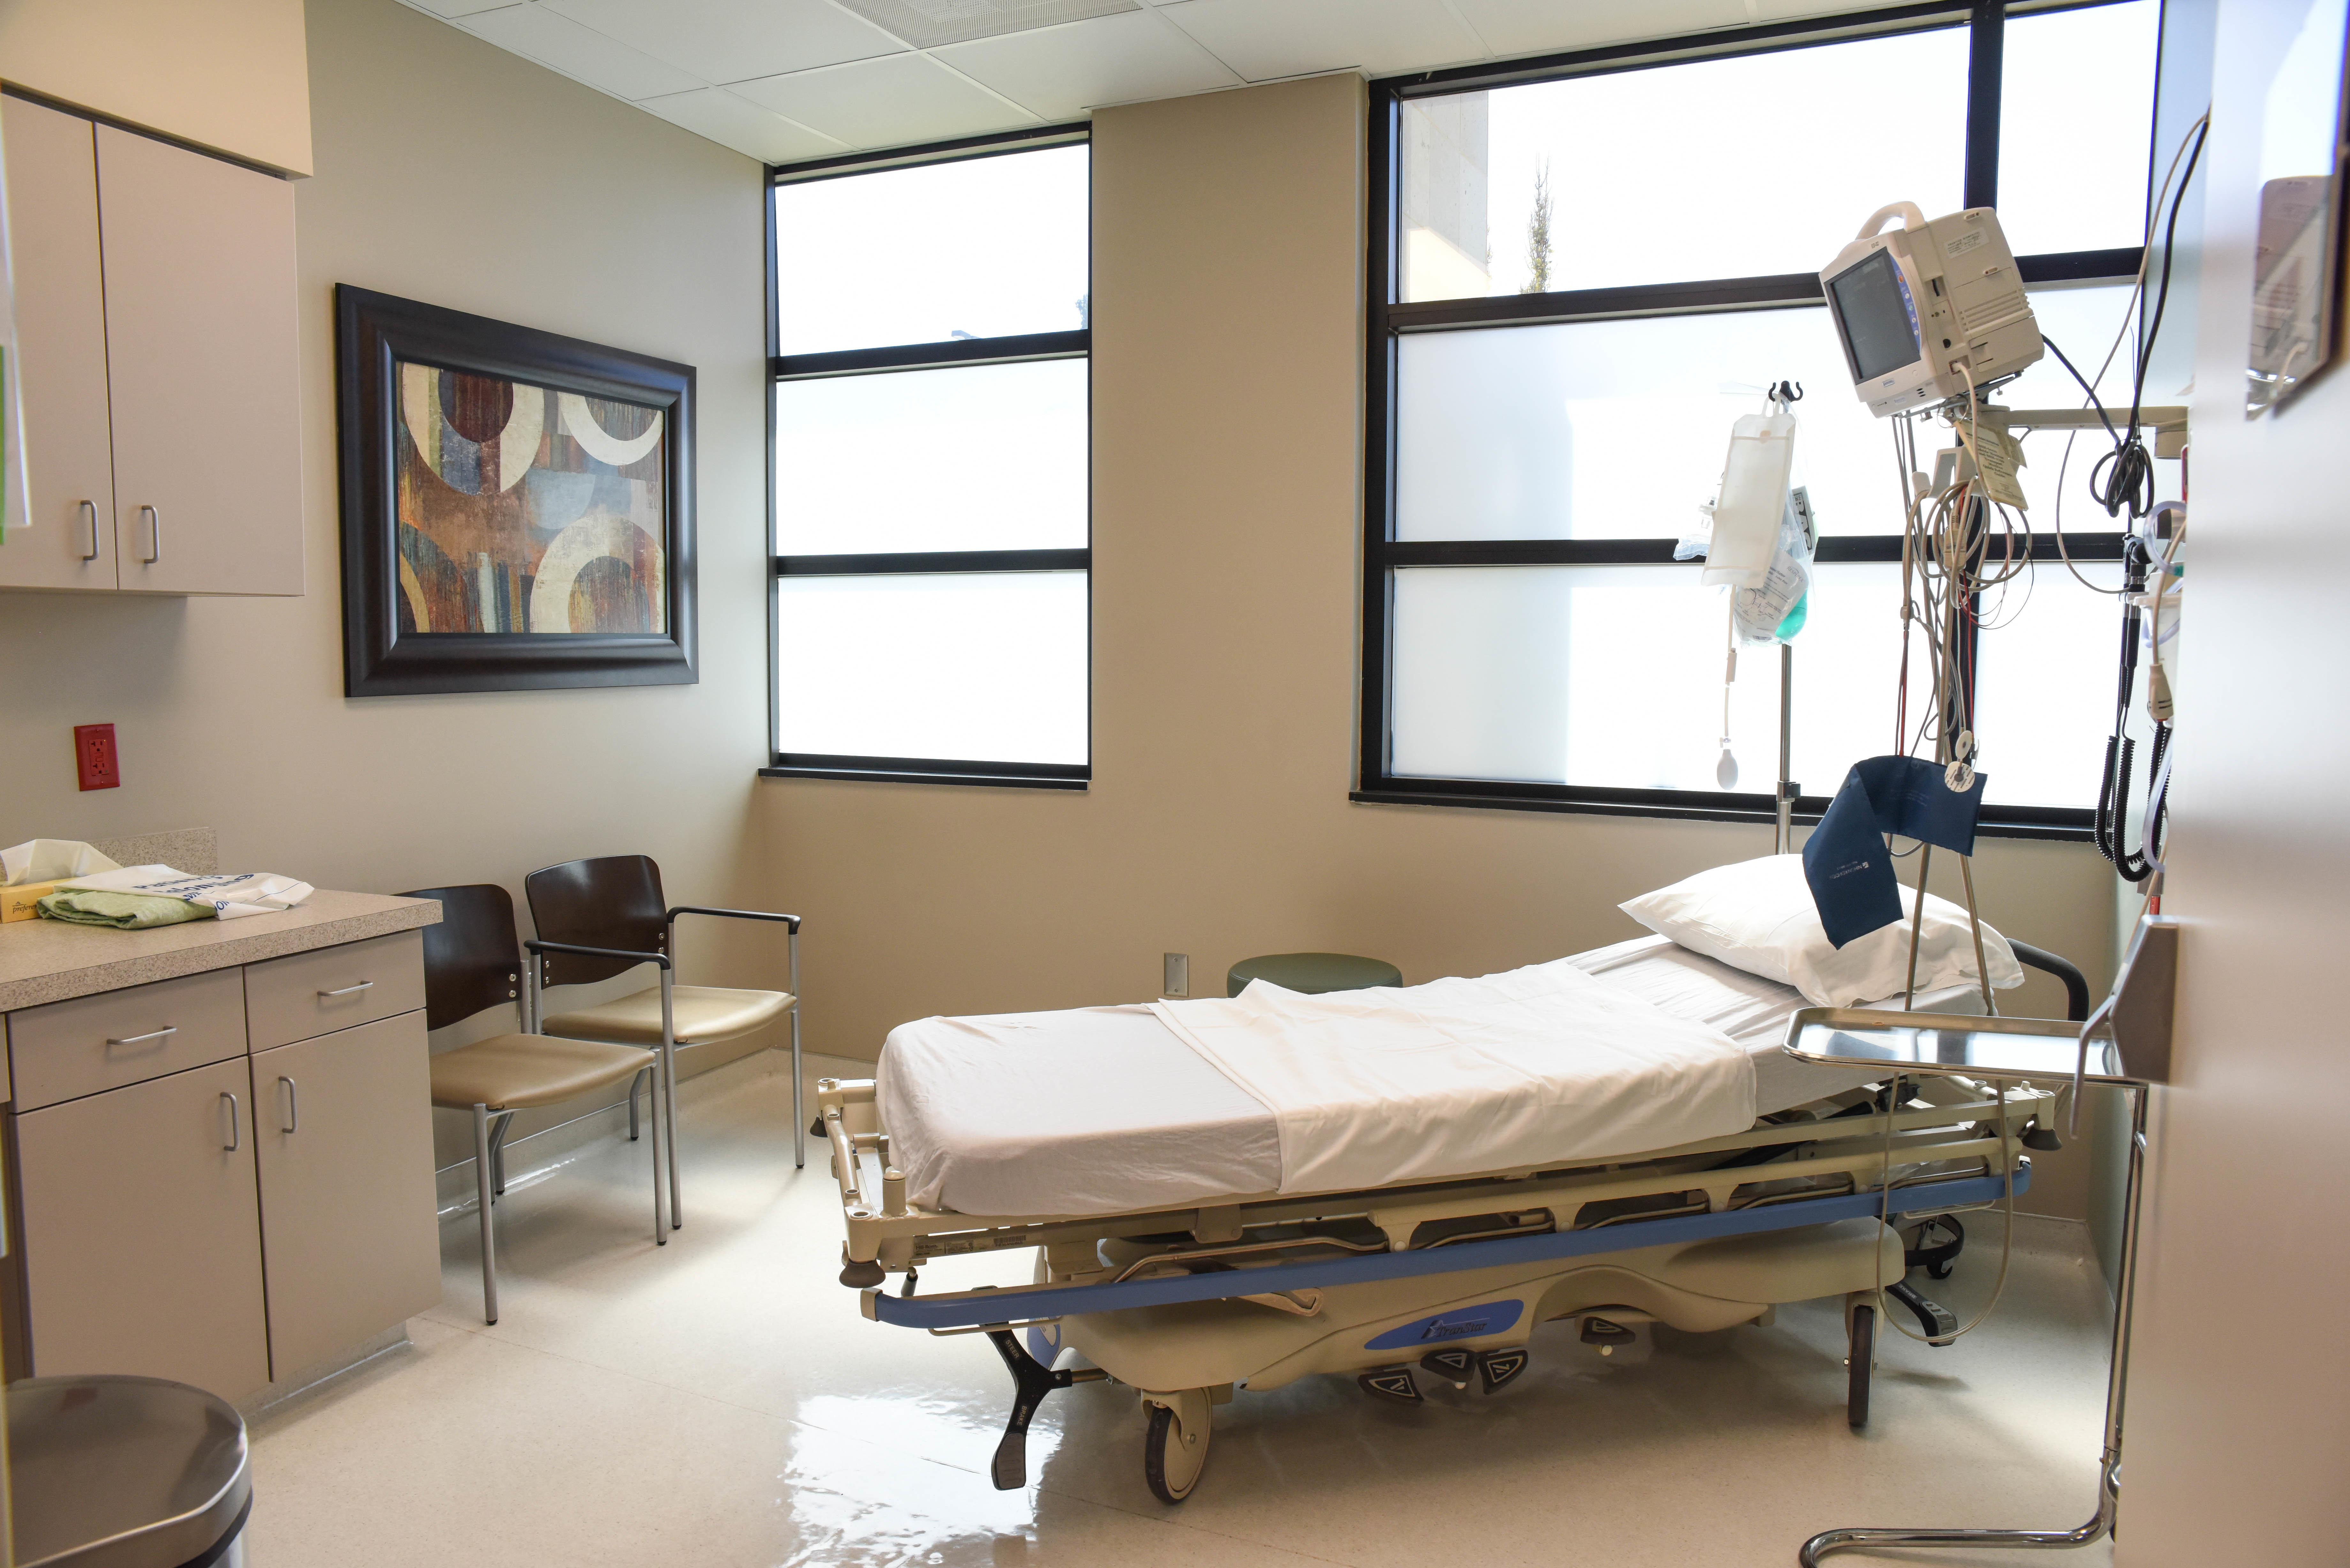 West Campus Emergency Room Midland Tx